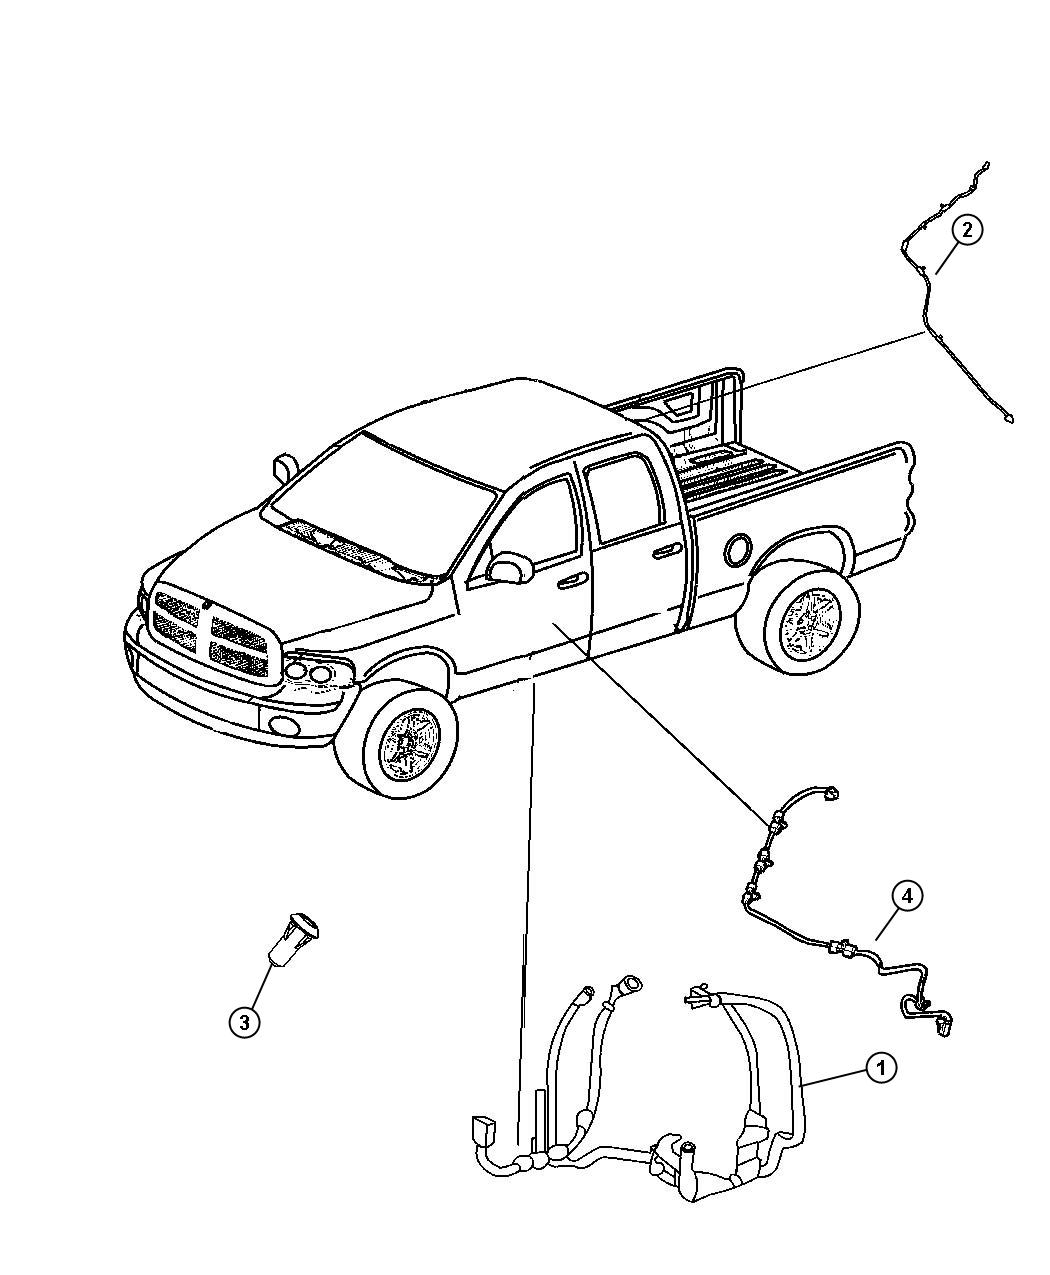 Dodge Ram 2500 Wiring  Body   Heated Second Row Seats